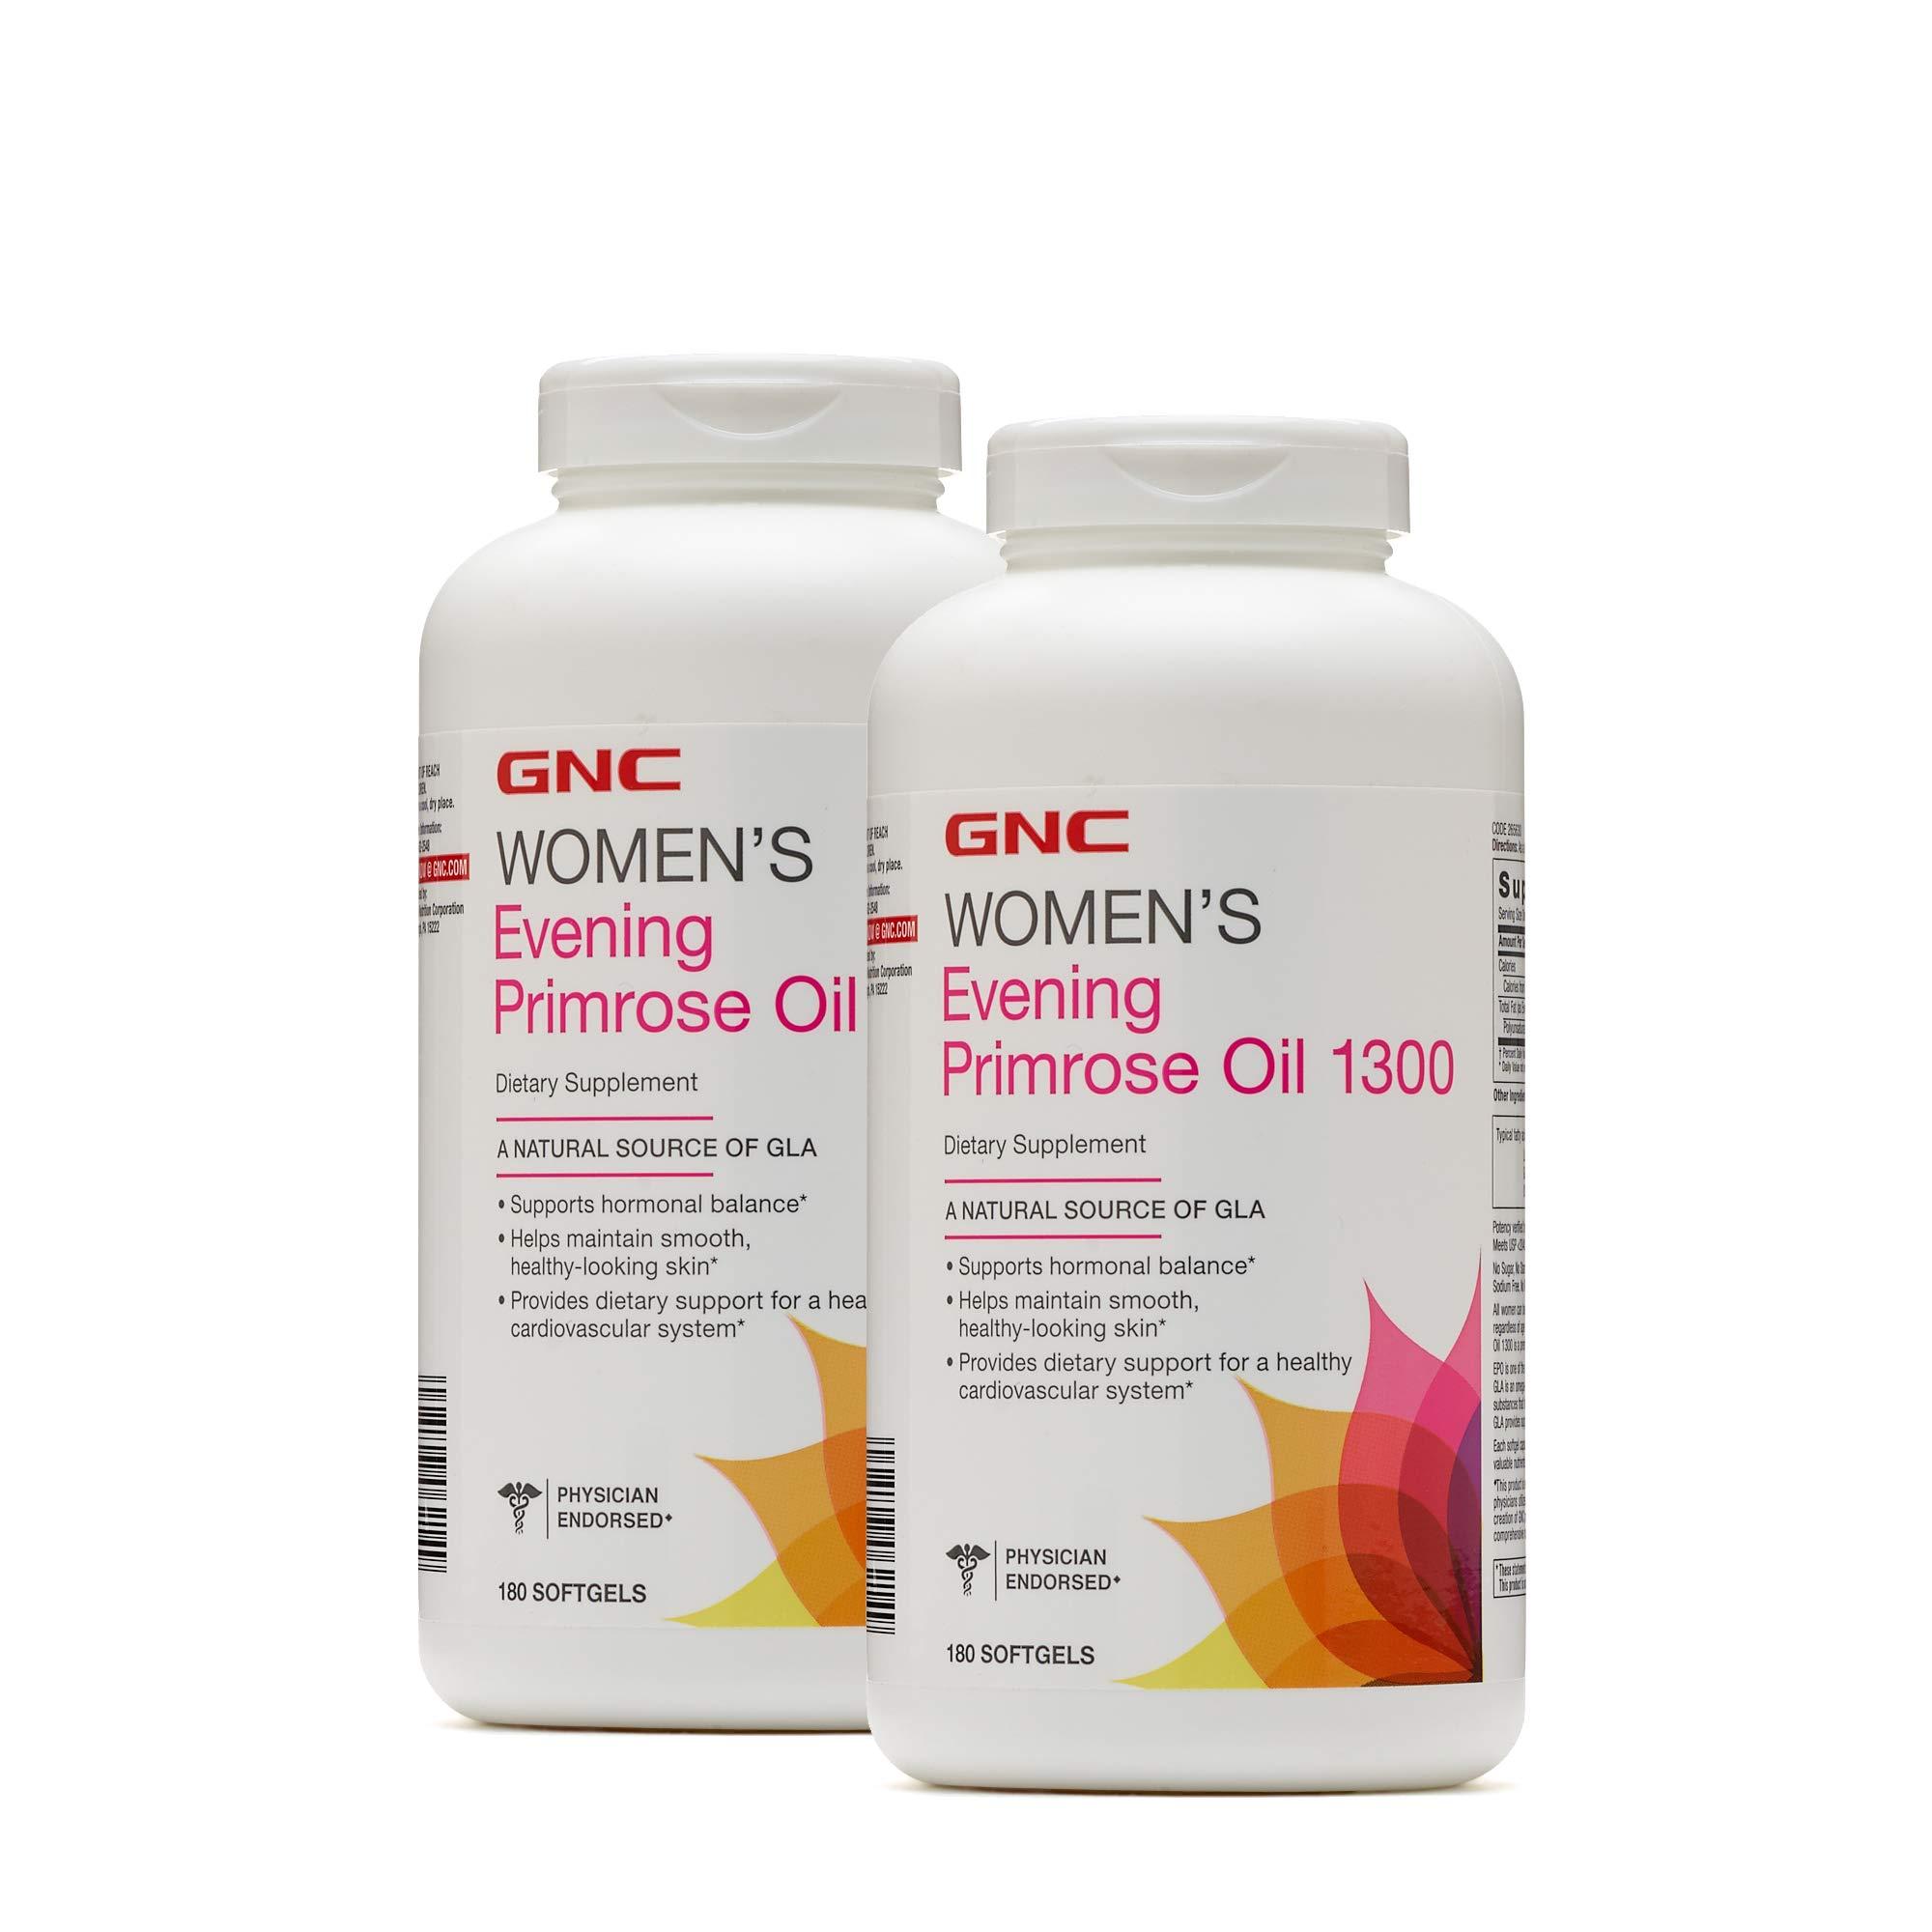 GNC Womens Evening Primrose Oil 1300mg - Twin Pack